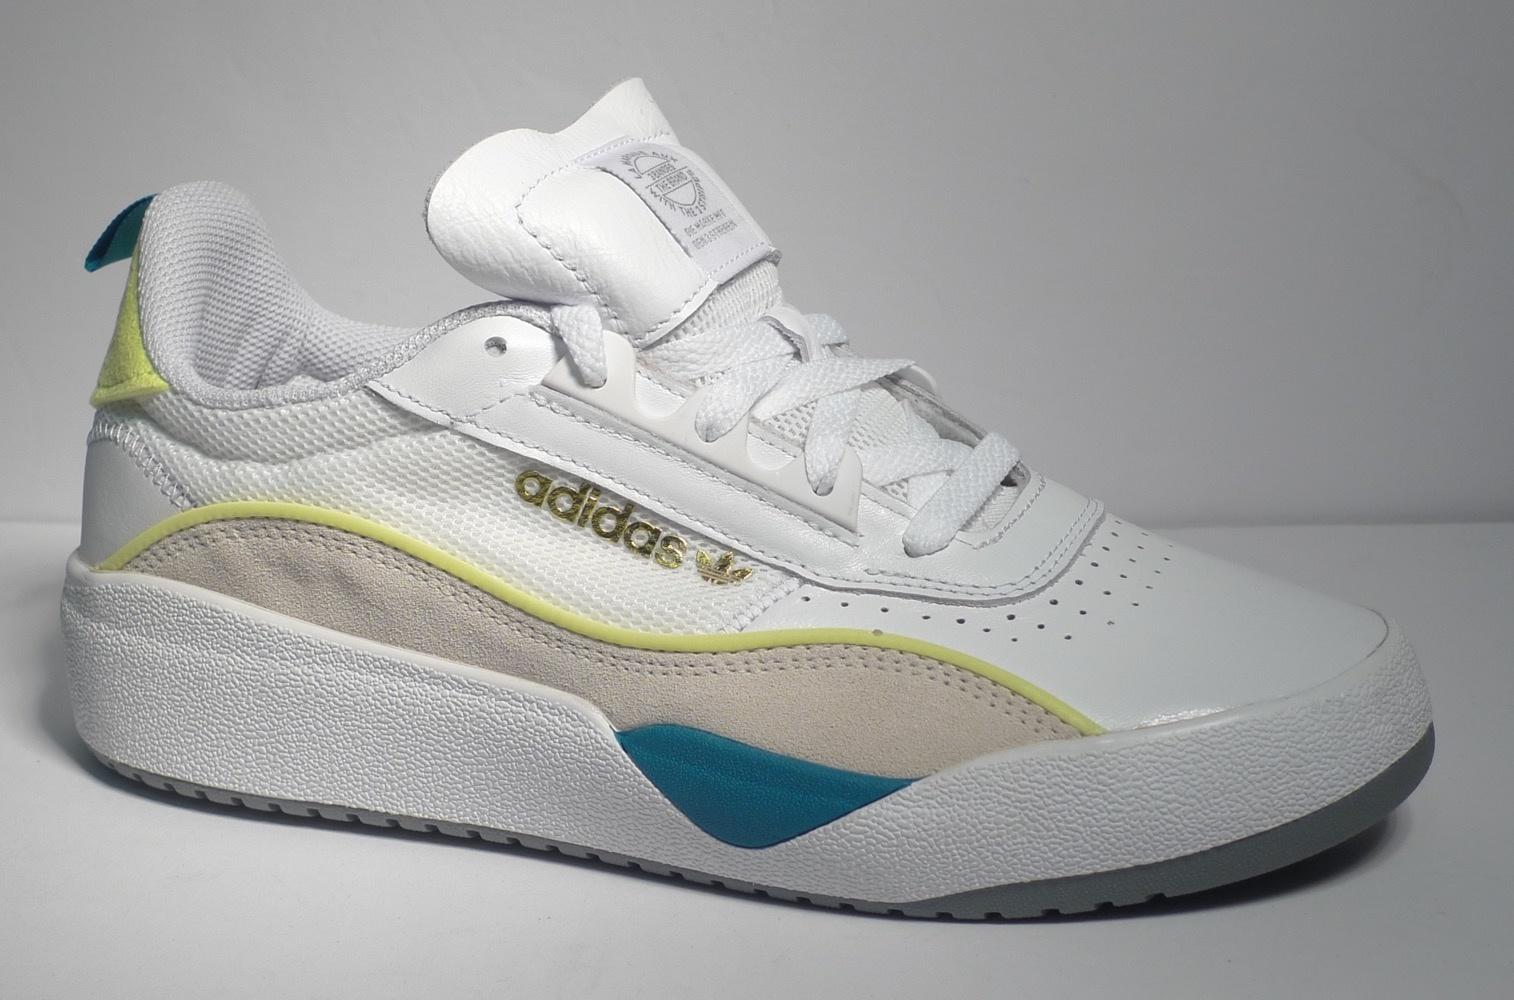 Adidas Adidas Liberty Cup - White/Chalk-White/Hi-Res Yellow